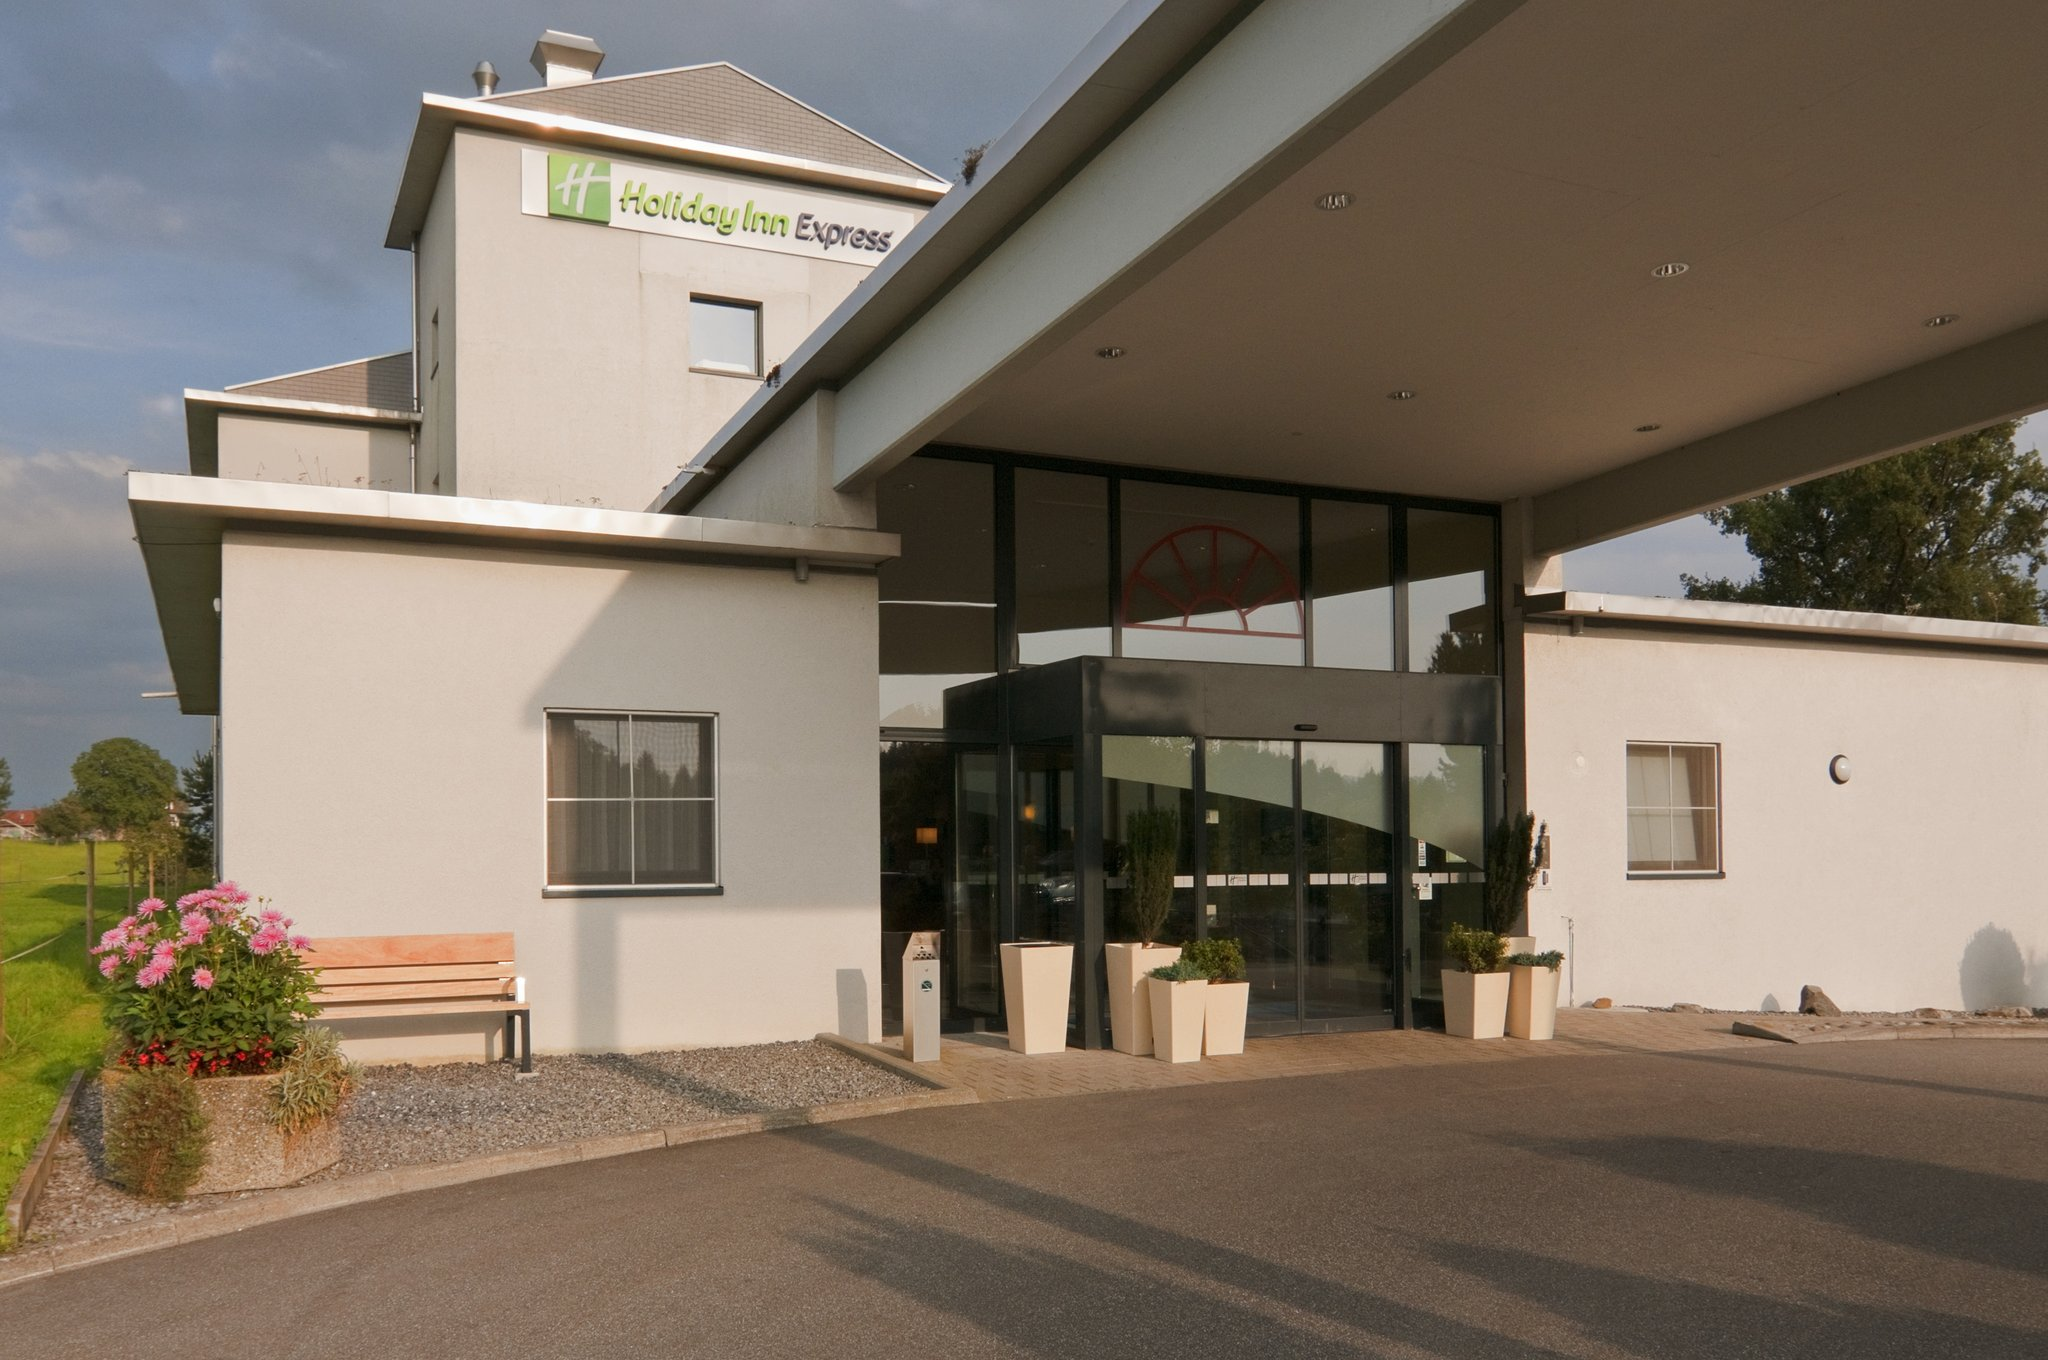 Holiday Inn Express Luzern Neuenkirch Rothenburg